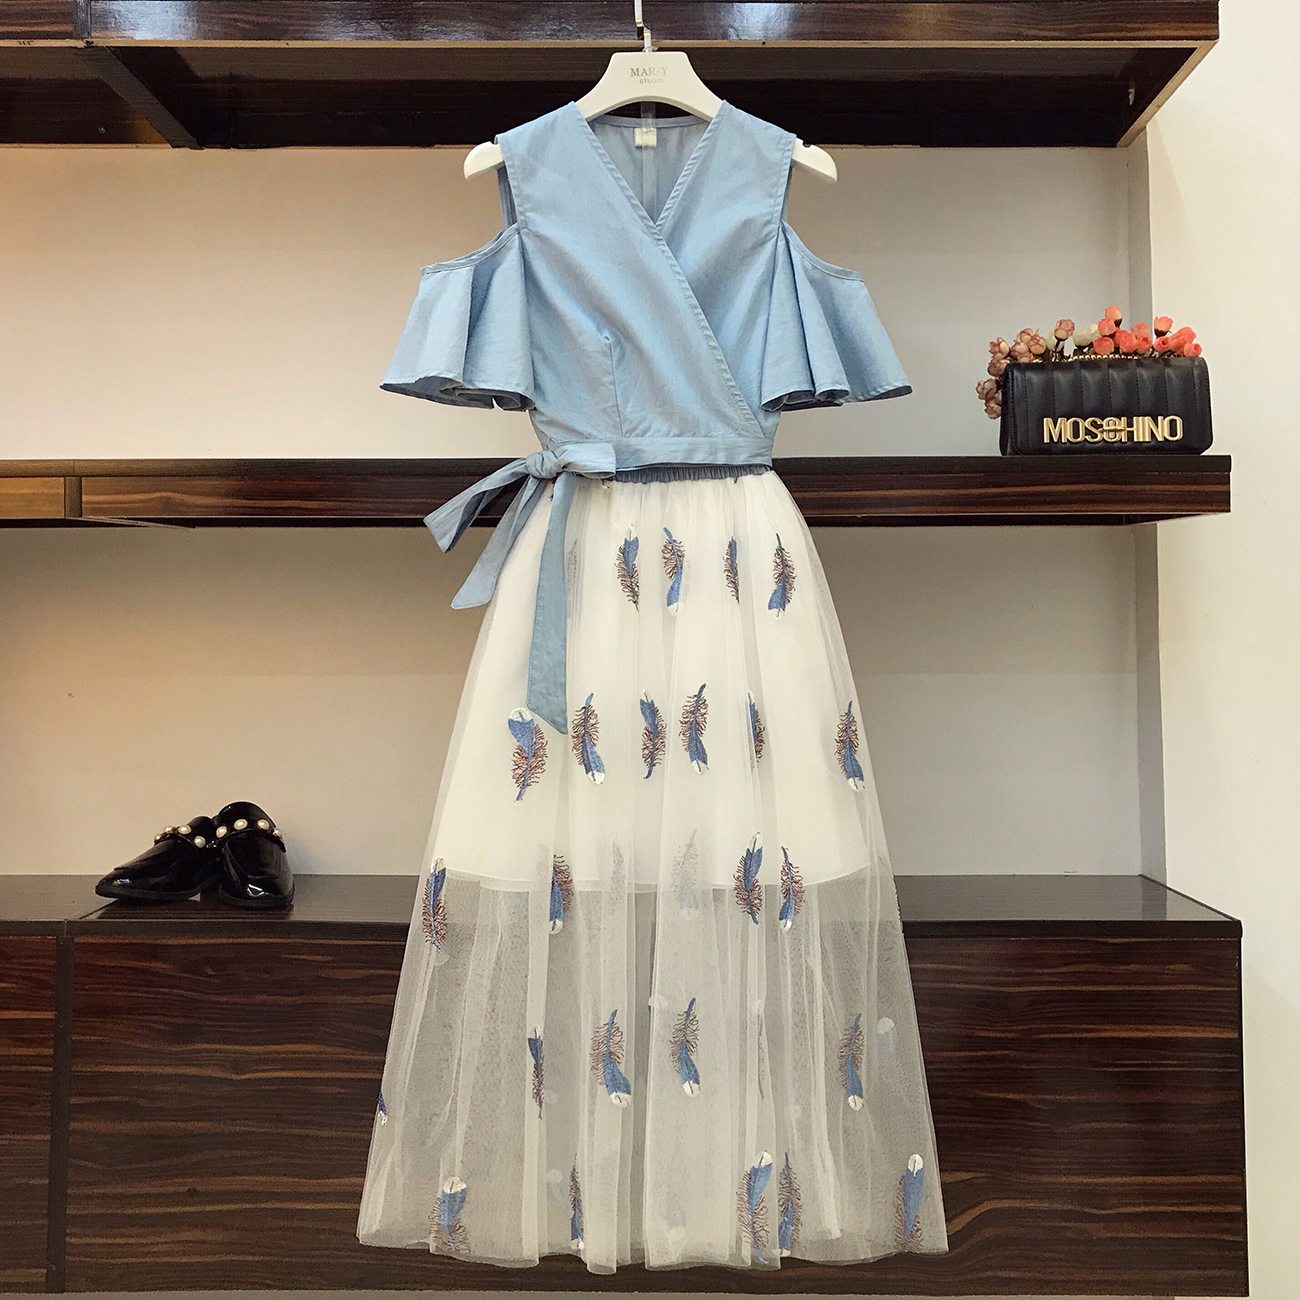 2018 Summer New Fashion Gauze Skirts Suit Women Lotus Leaf Side Big V Collar Short Shirt + Feather Embroidered Gauze Skirt Sets